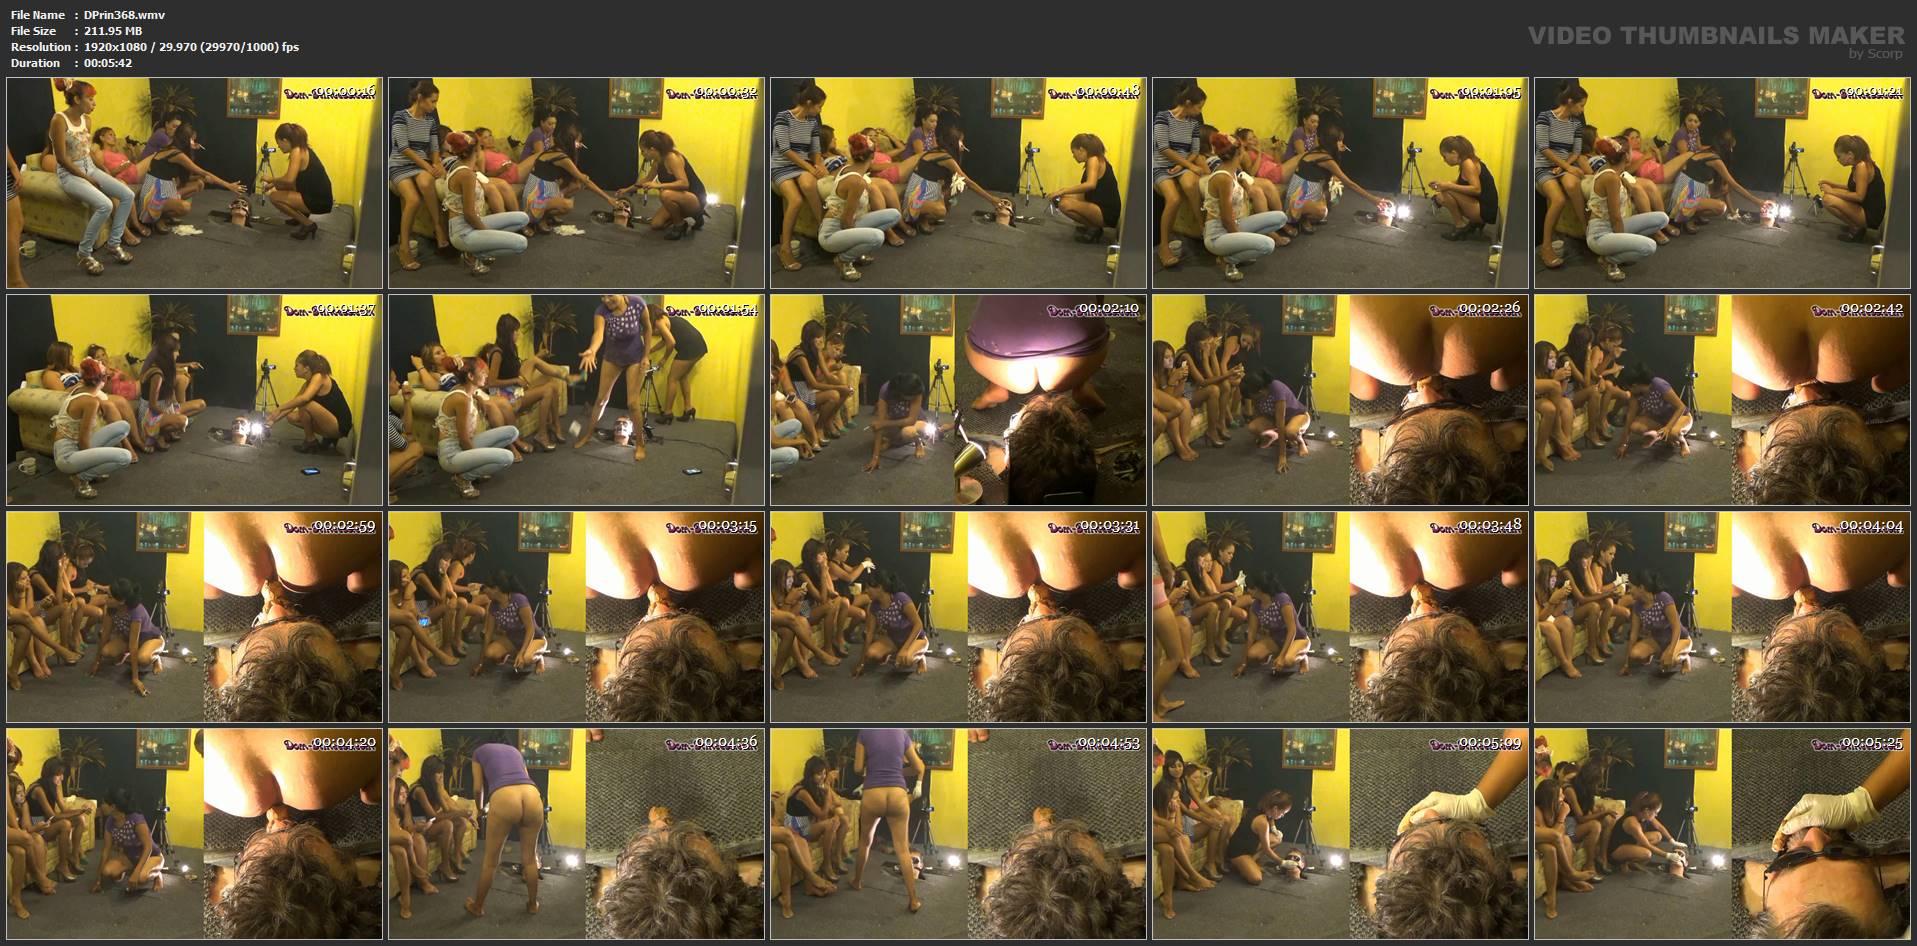 [DOM-PRINCESS] Under Floor Tube Biter Part 1 Britany [FULL HD][1080p][WMV]